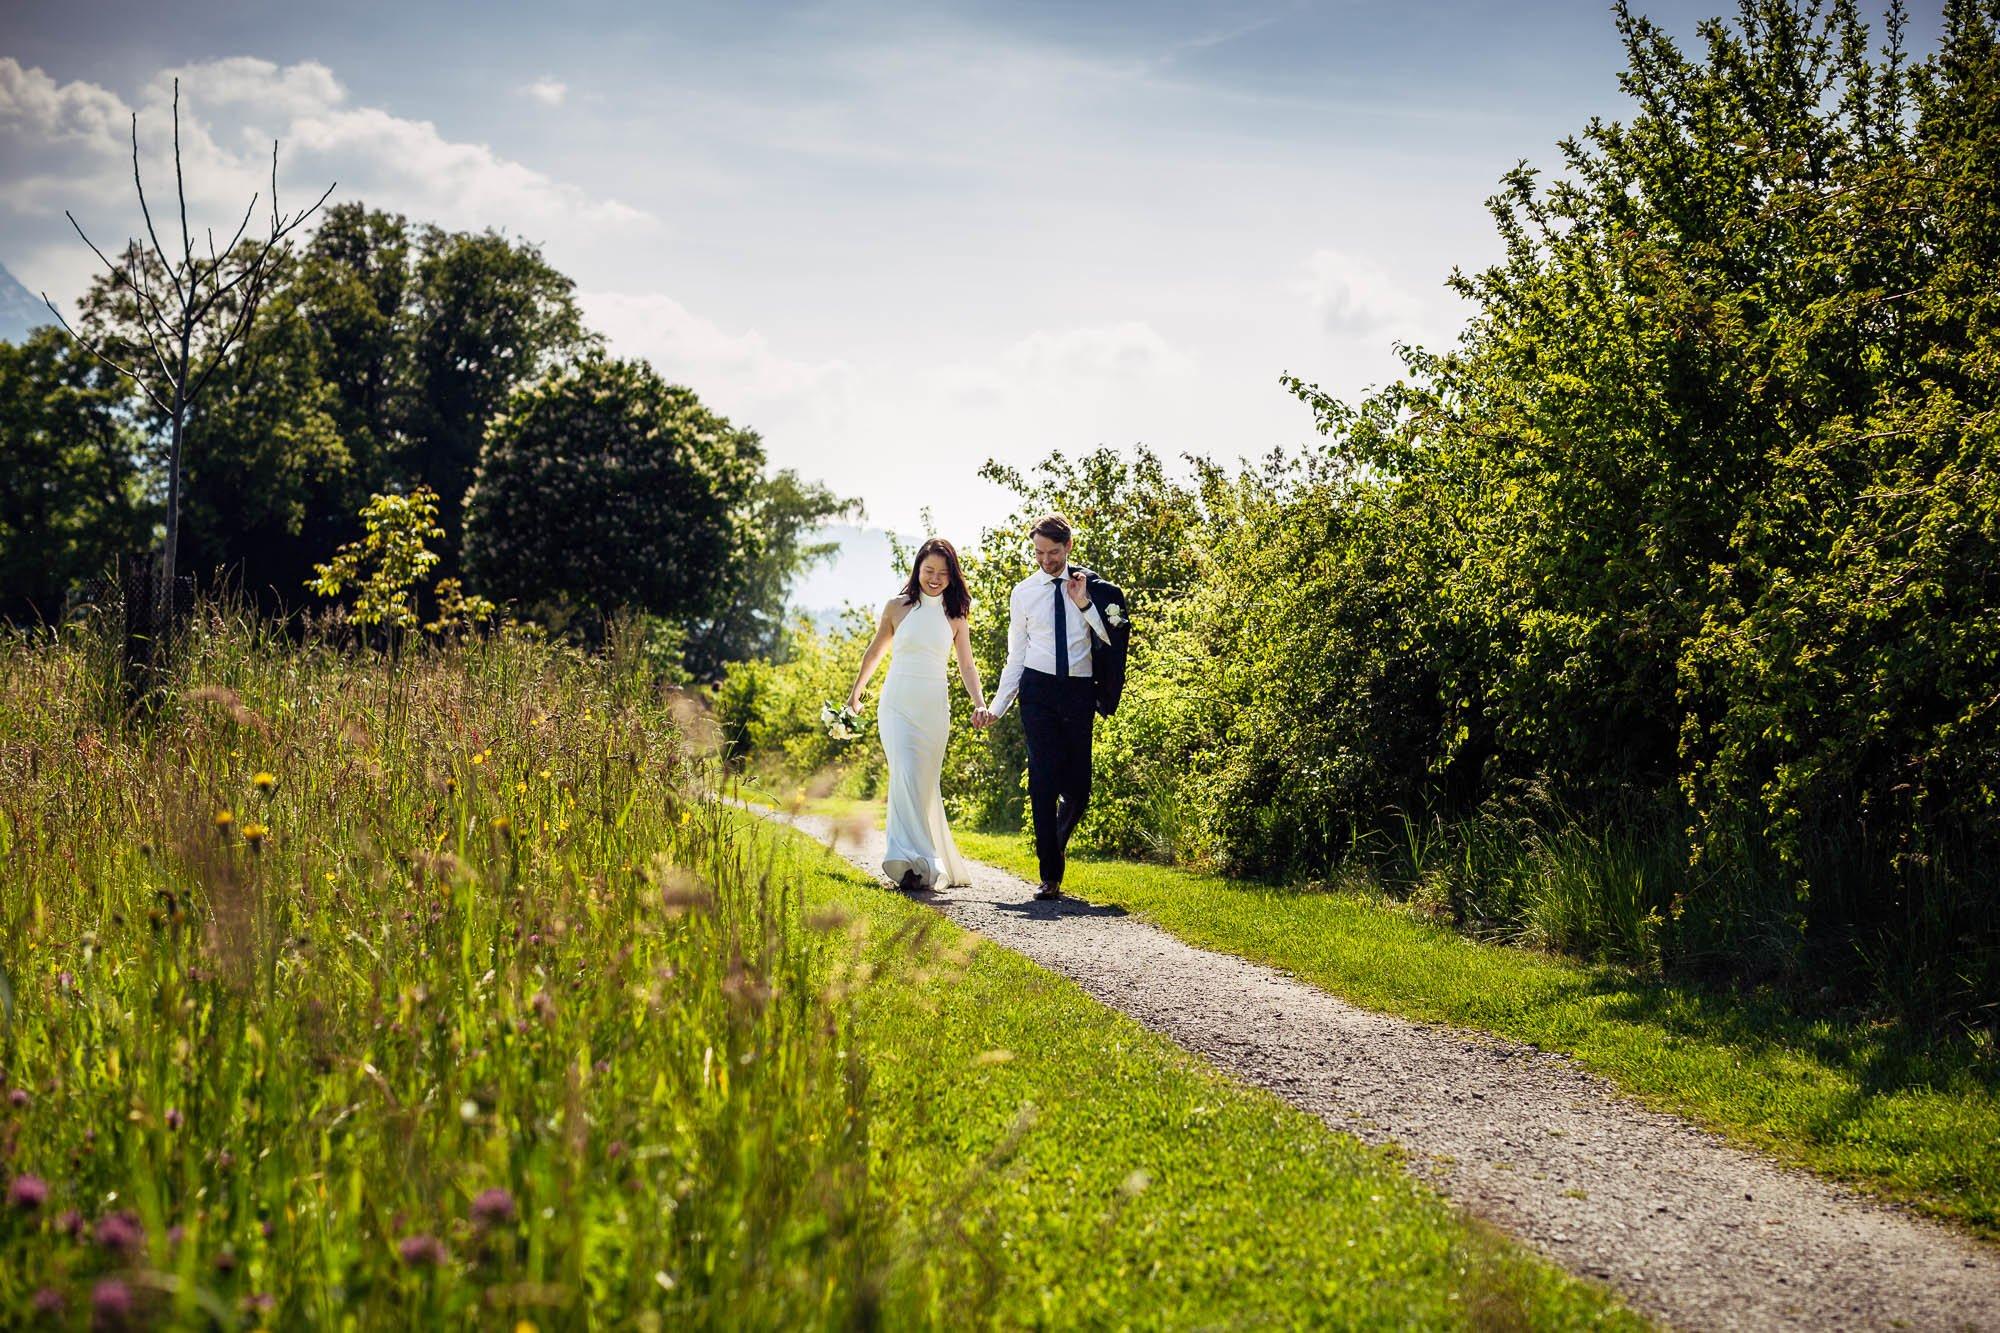 Brautpaar geht auf Feldweg